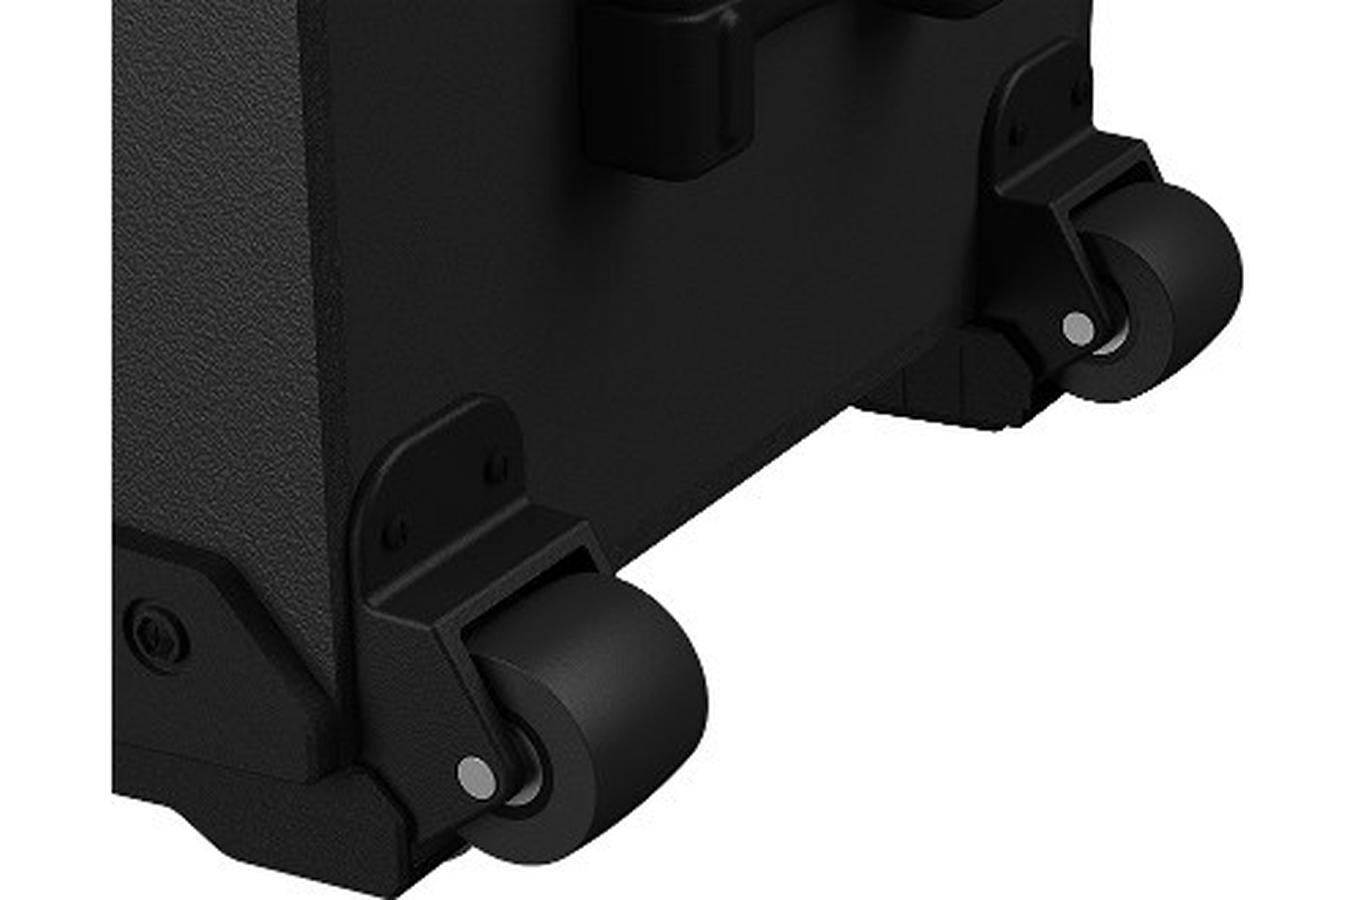 enceinte bluetooth sans fil panasonic sc cmax5e k 4221672 darty. Black Bedroom Furniture Sets. Home Design Ideas